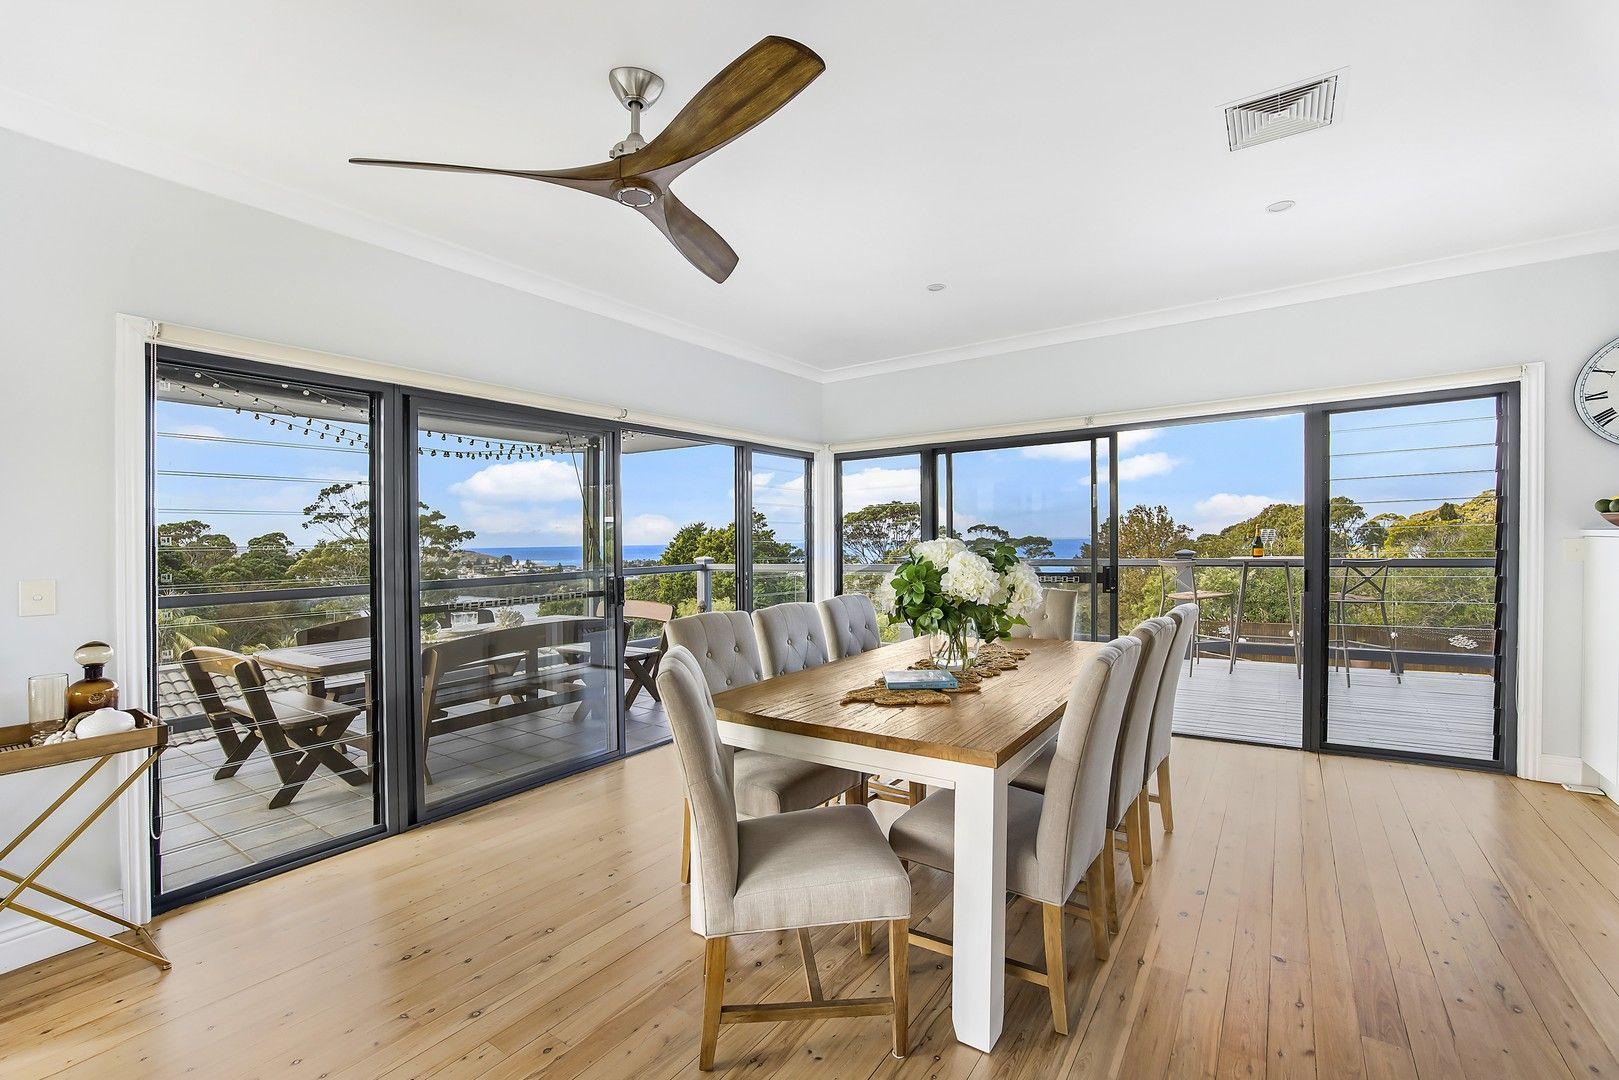 133 Fuller Street, Collaroy Plateau NSW 2097, Image 0